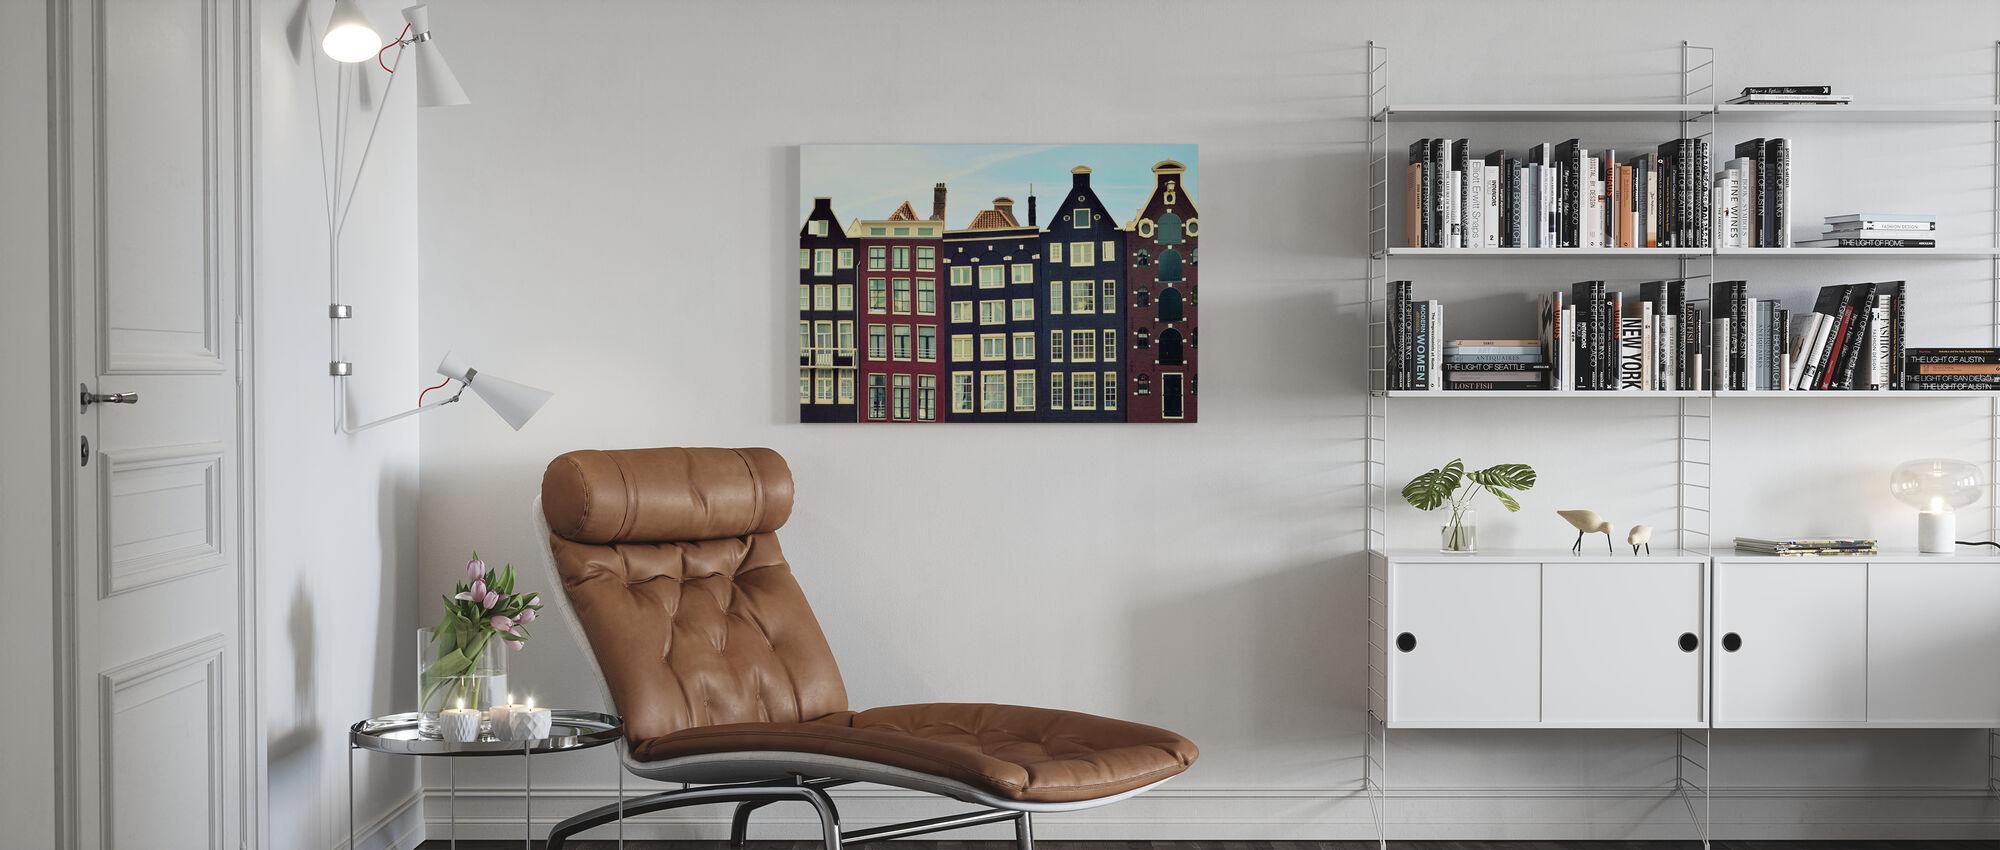 Amsterdamse Huizen - Canvas print - Woonkamer